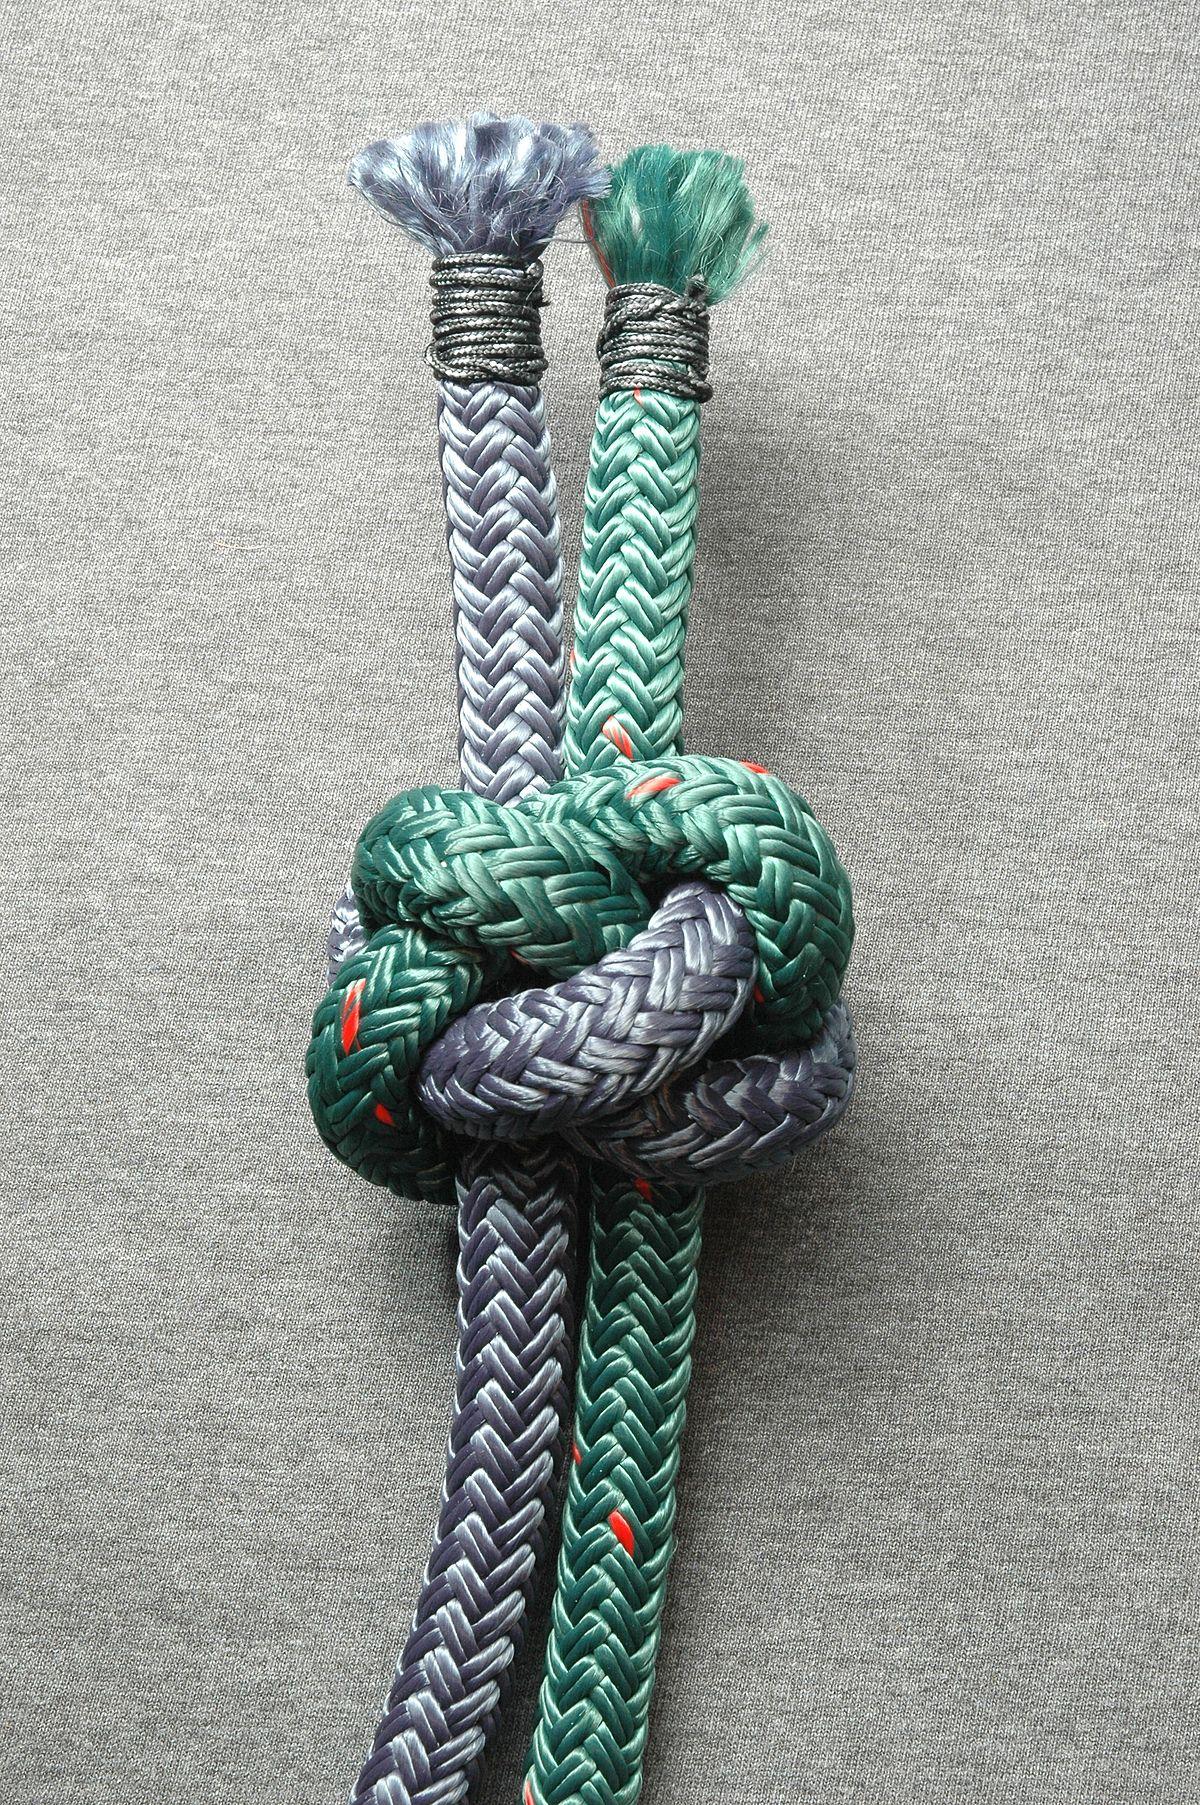 knife lanyard knot instructions